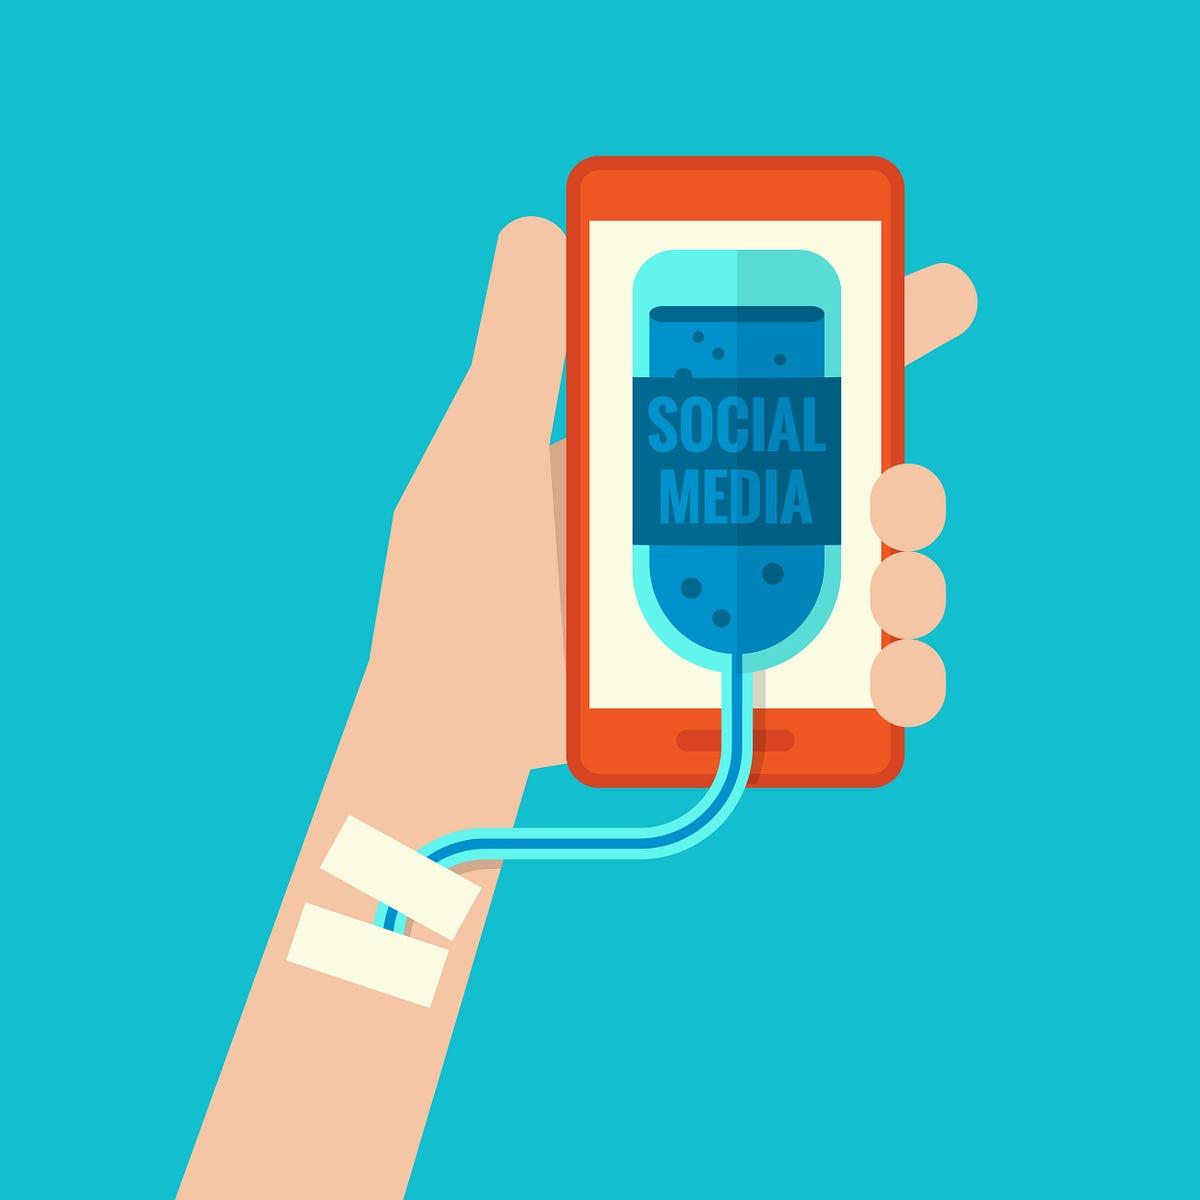 Social Media In The Offline World A Mental Illness Epidemic